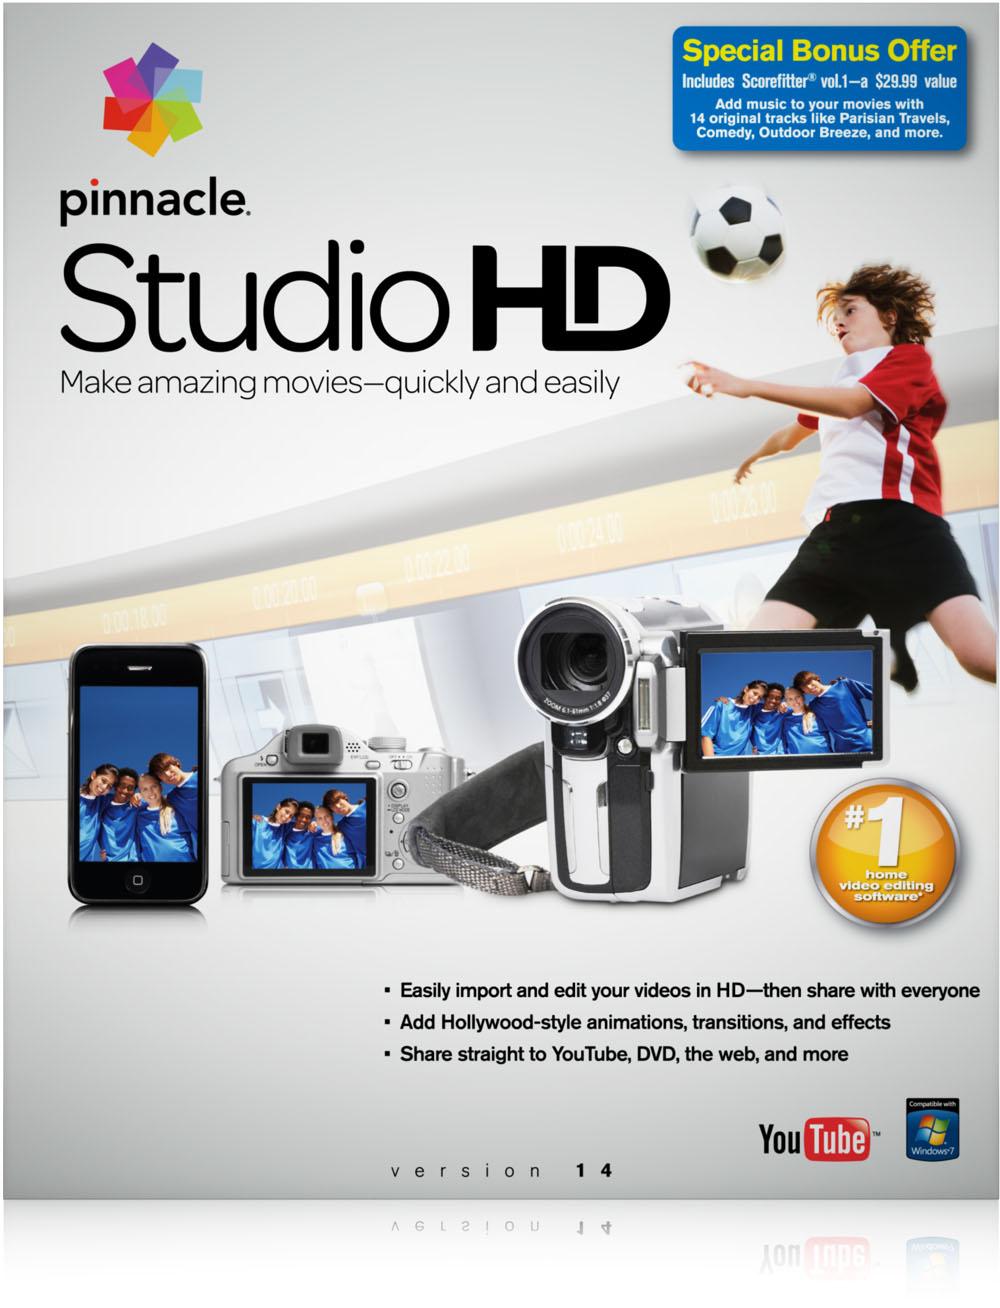 Video Editing Software Free Download Windows 7 32 Bit